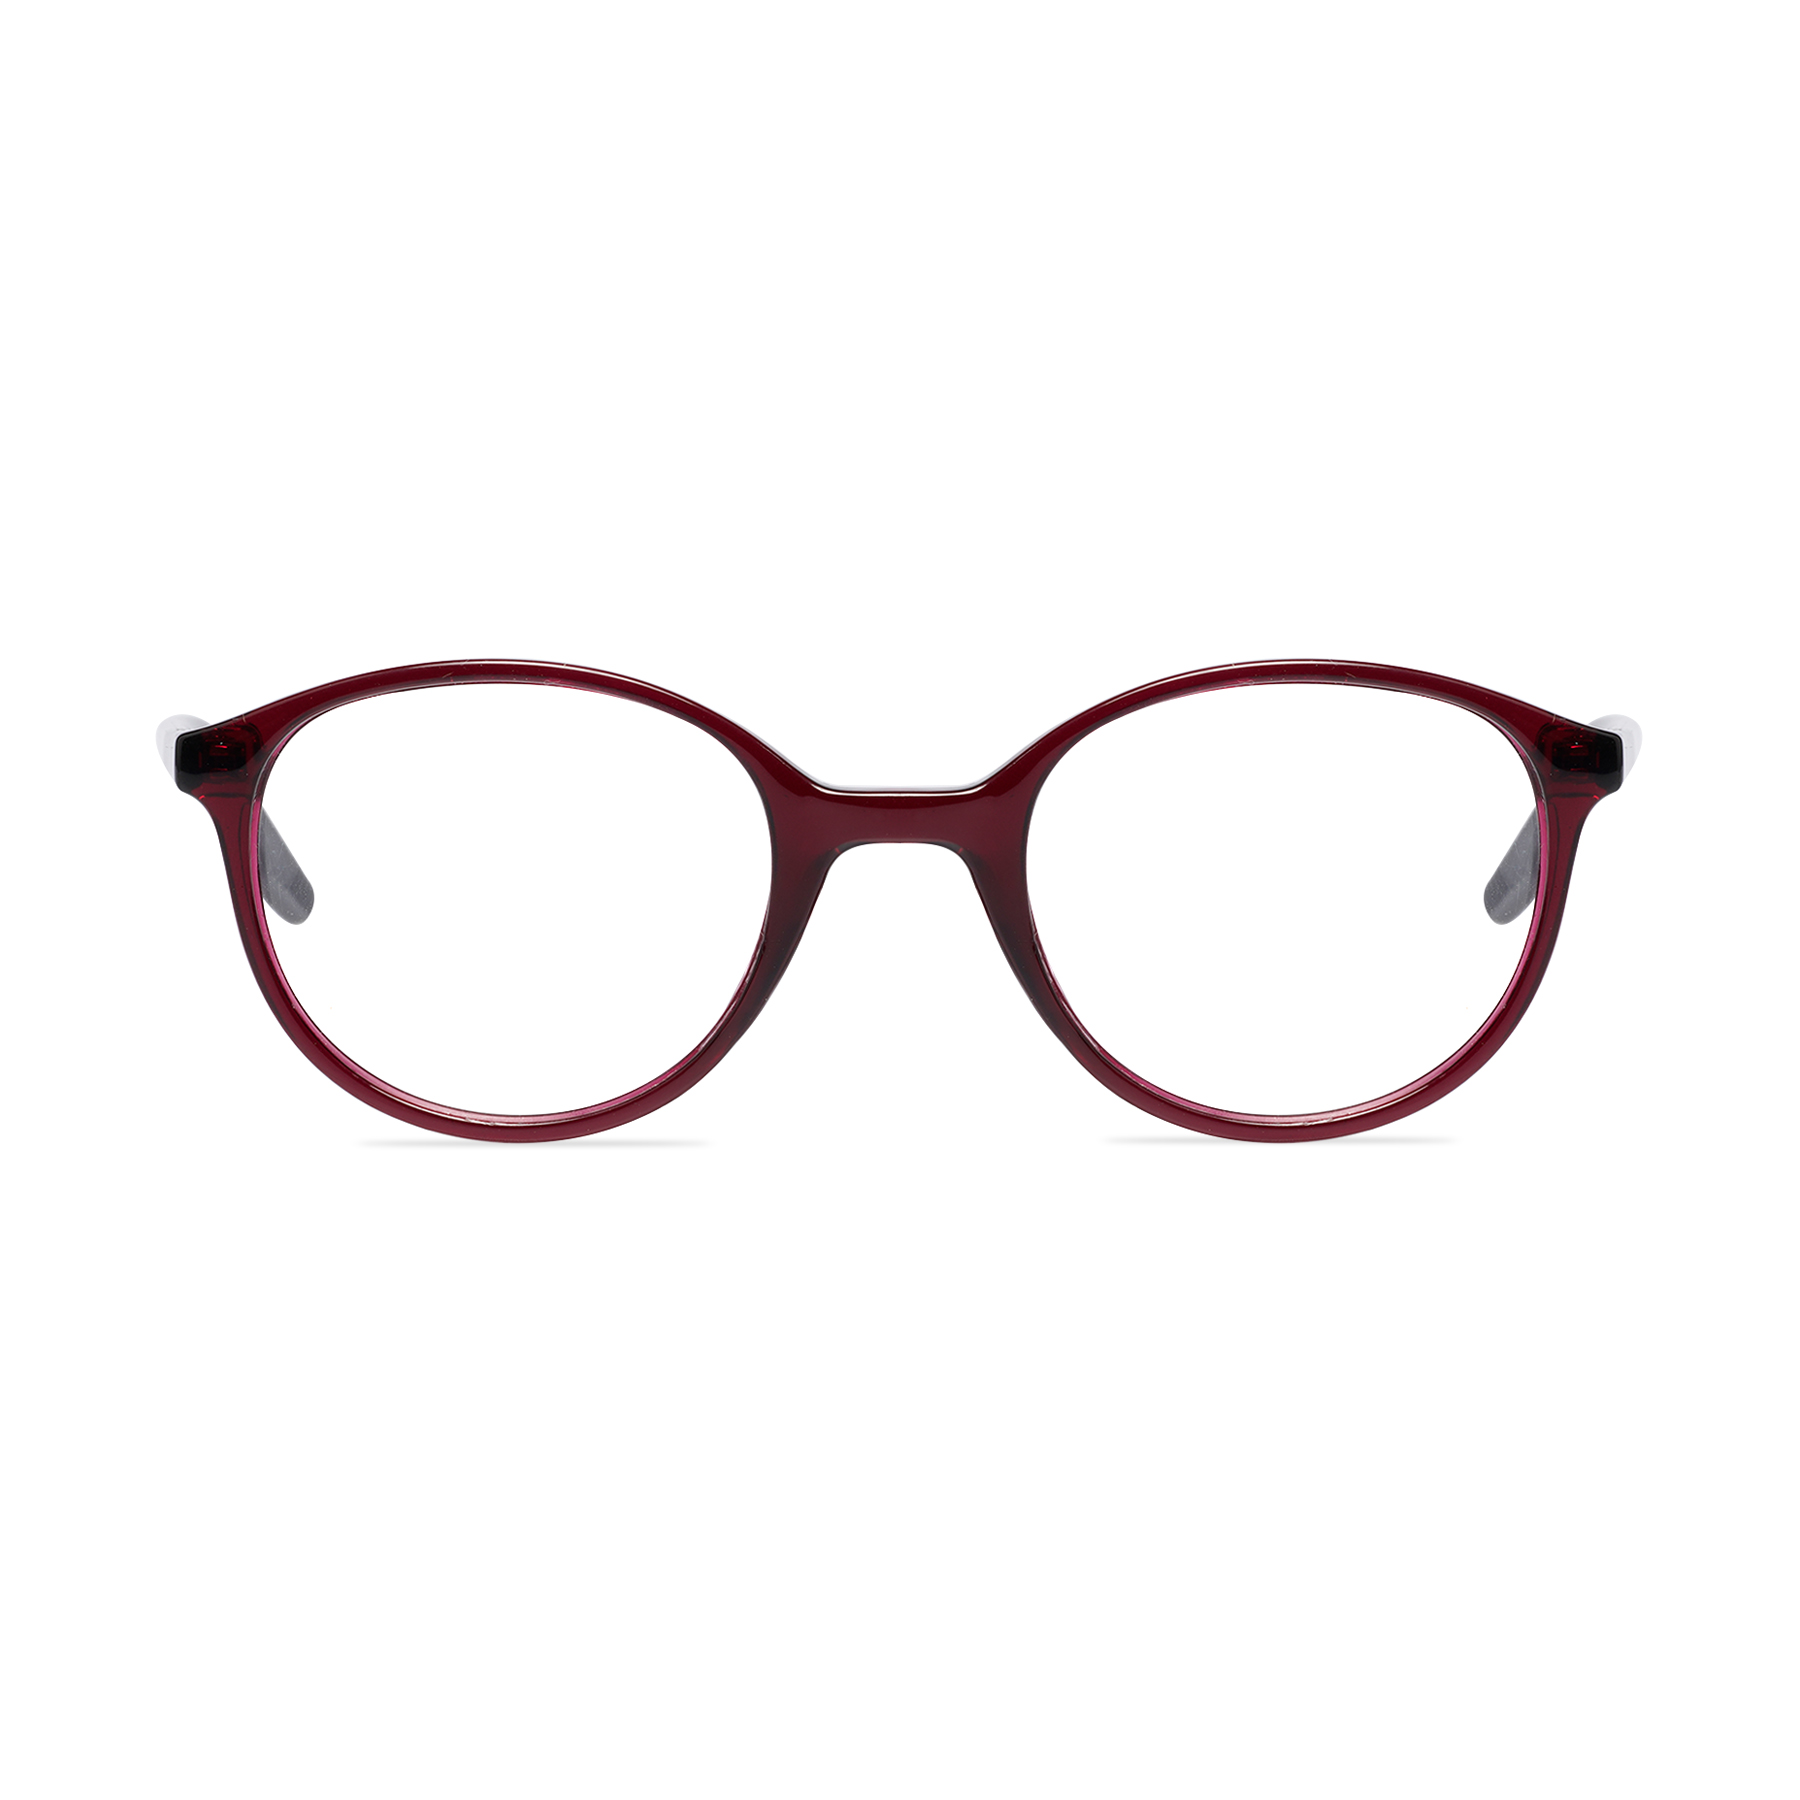 Vinaldi 2056 Optical Frames